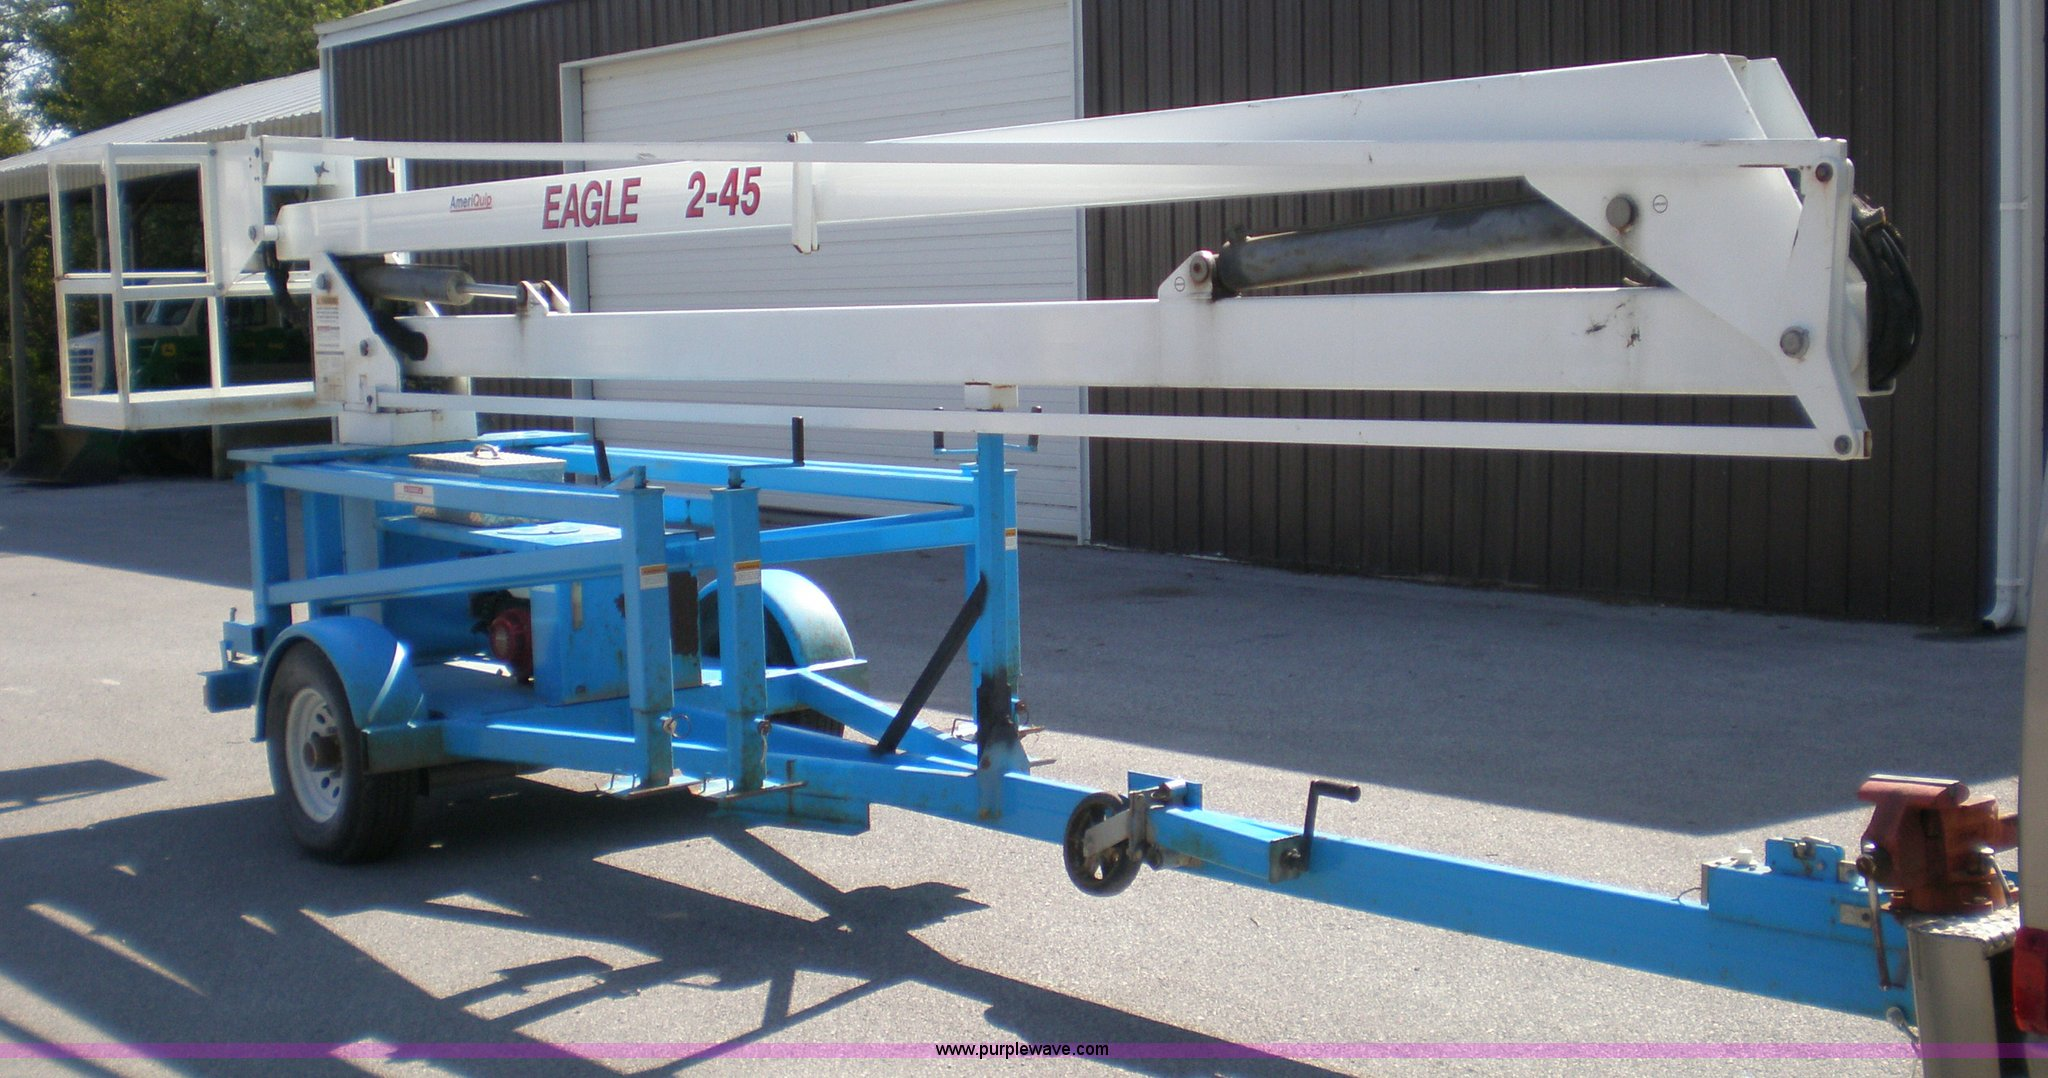 CA_5917] Eagle 2 45 Lift Wiring Diagram Wiring DiagramObenz Wida Tran Kapemie Mohammedshrine Librar Wiring 101